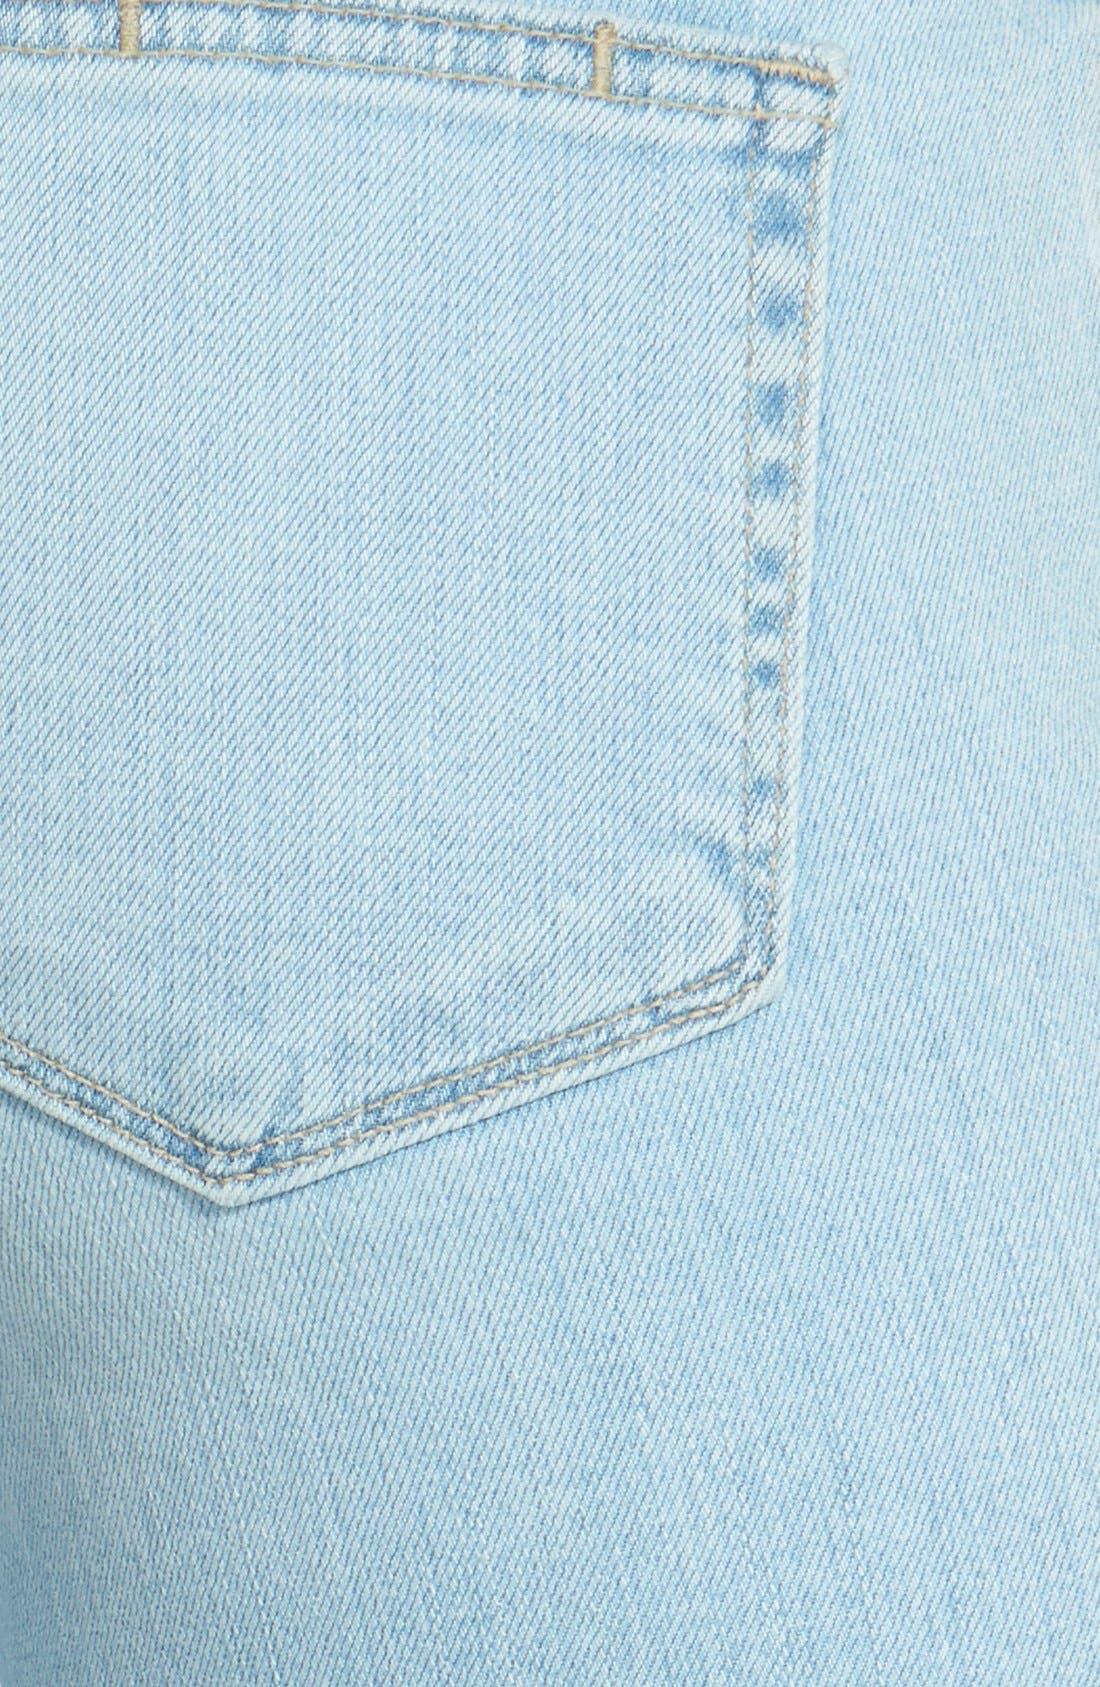 Alternate Image 3  - Paige Denim 'Verdugo' Ultra Skinny Jeans (Naomi Embellished)